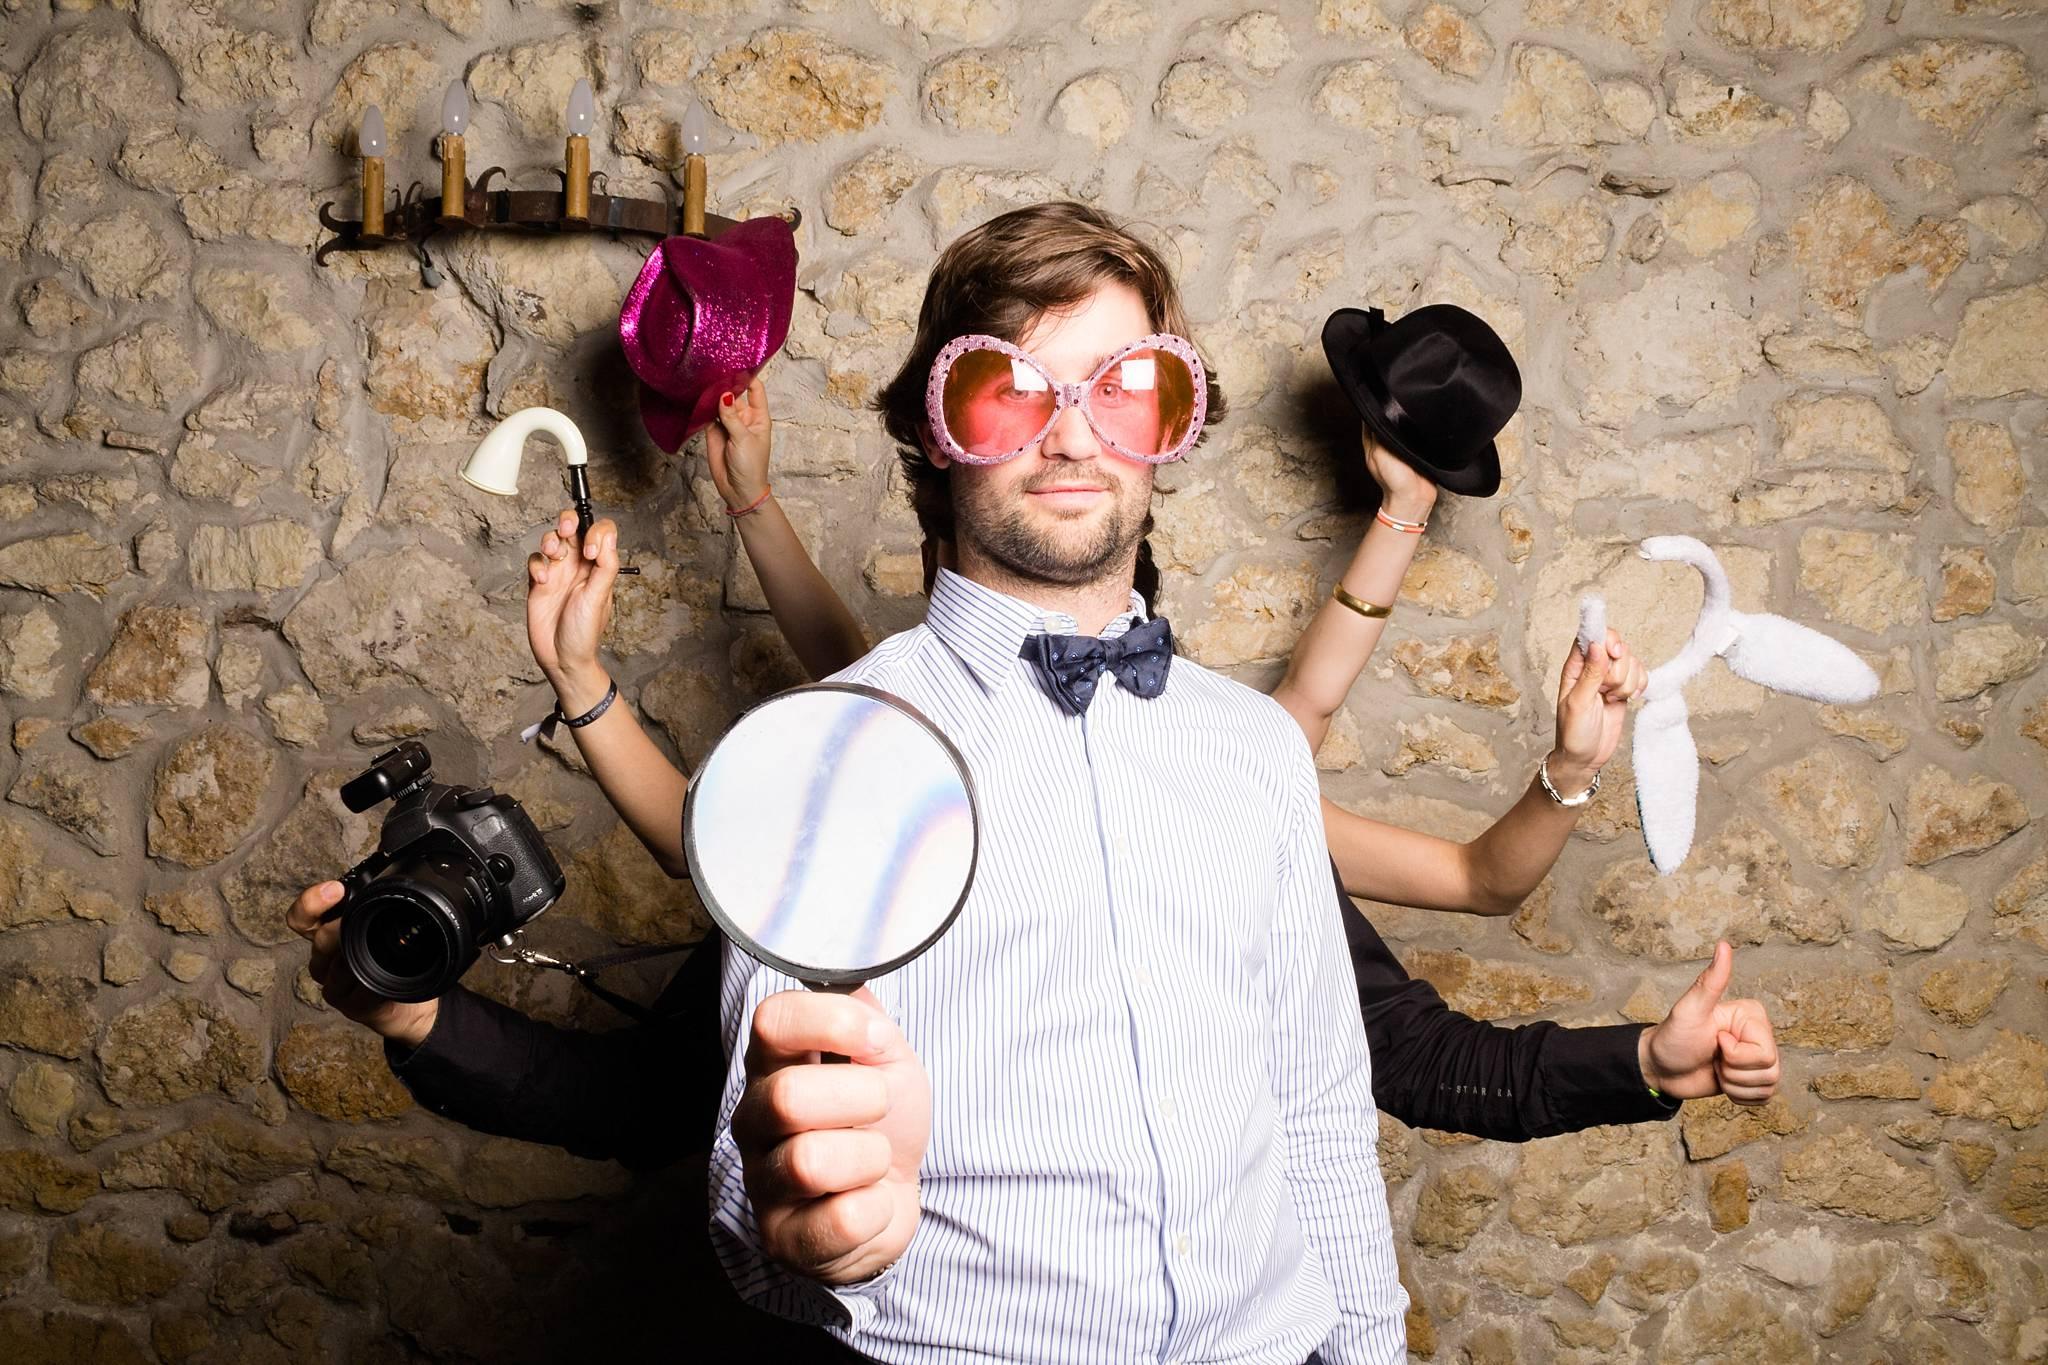 02_photobooth-mariage-bordeaux-gironde-dordogne-charentes-alexandre-roschewitz-photographies_2048px